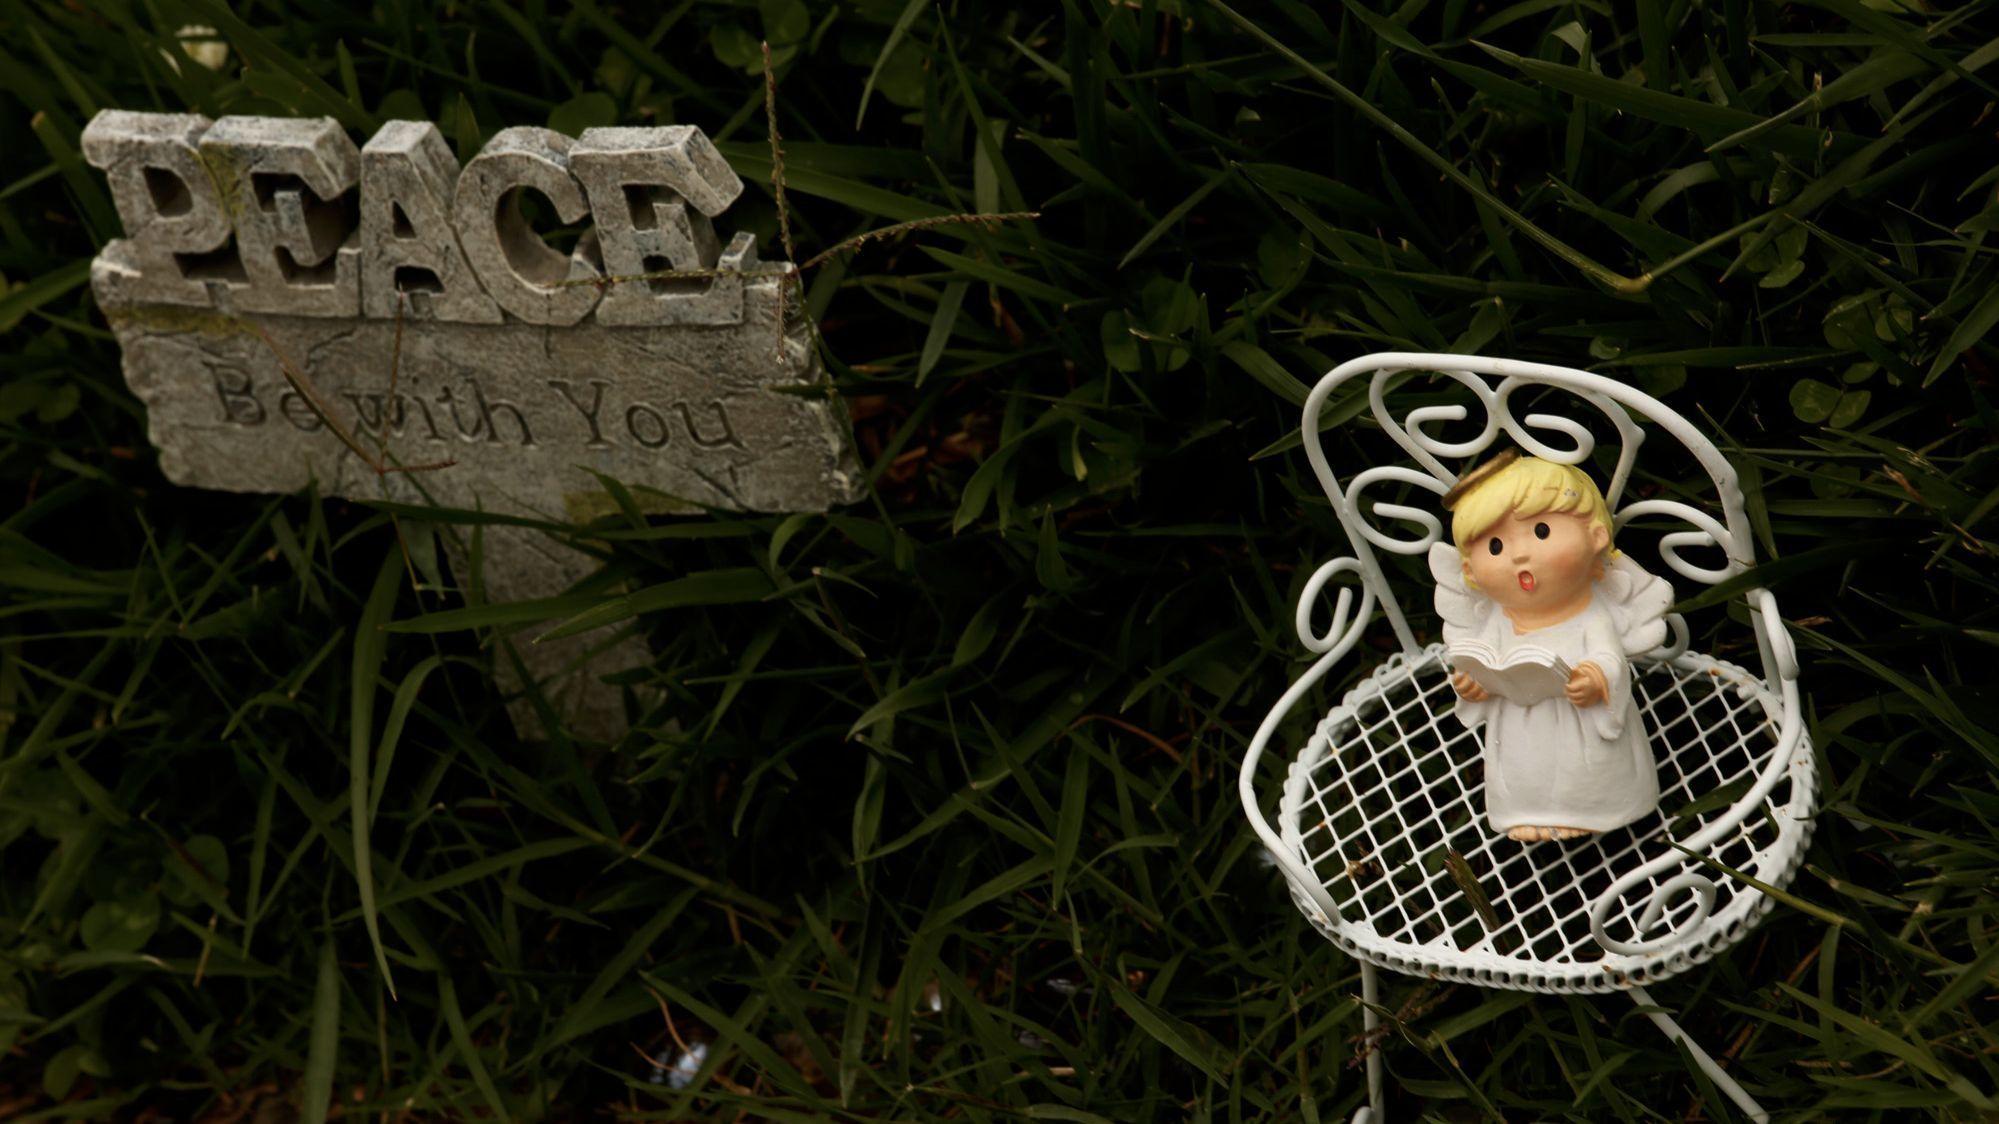 A small angel rests near the gravesite of Bree'Anna Guzman.